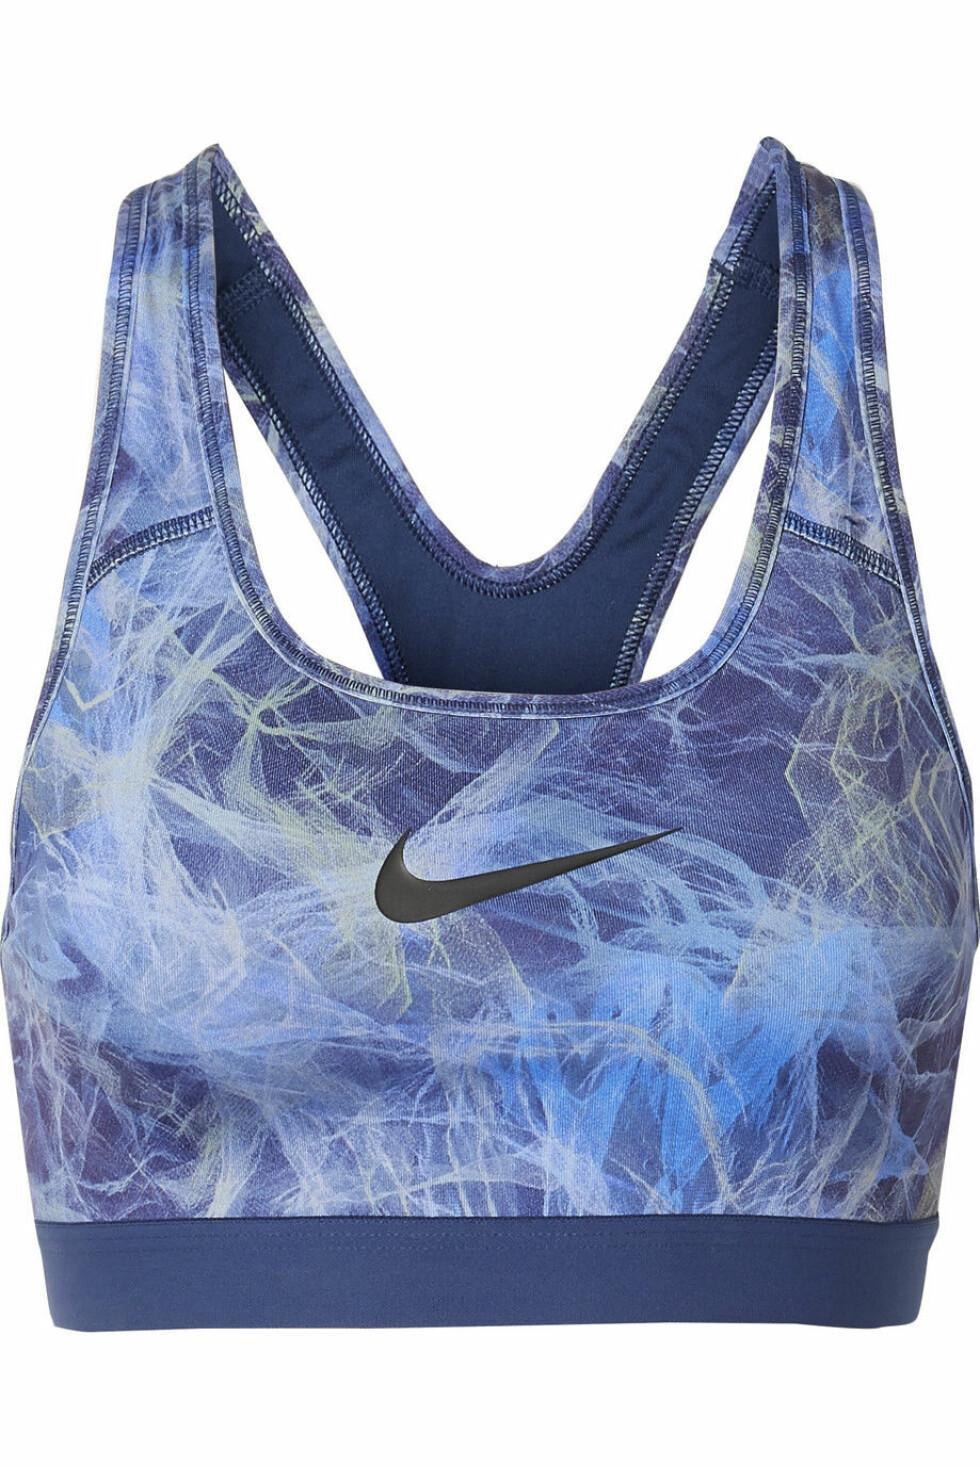 Nike, kr 350